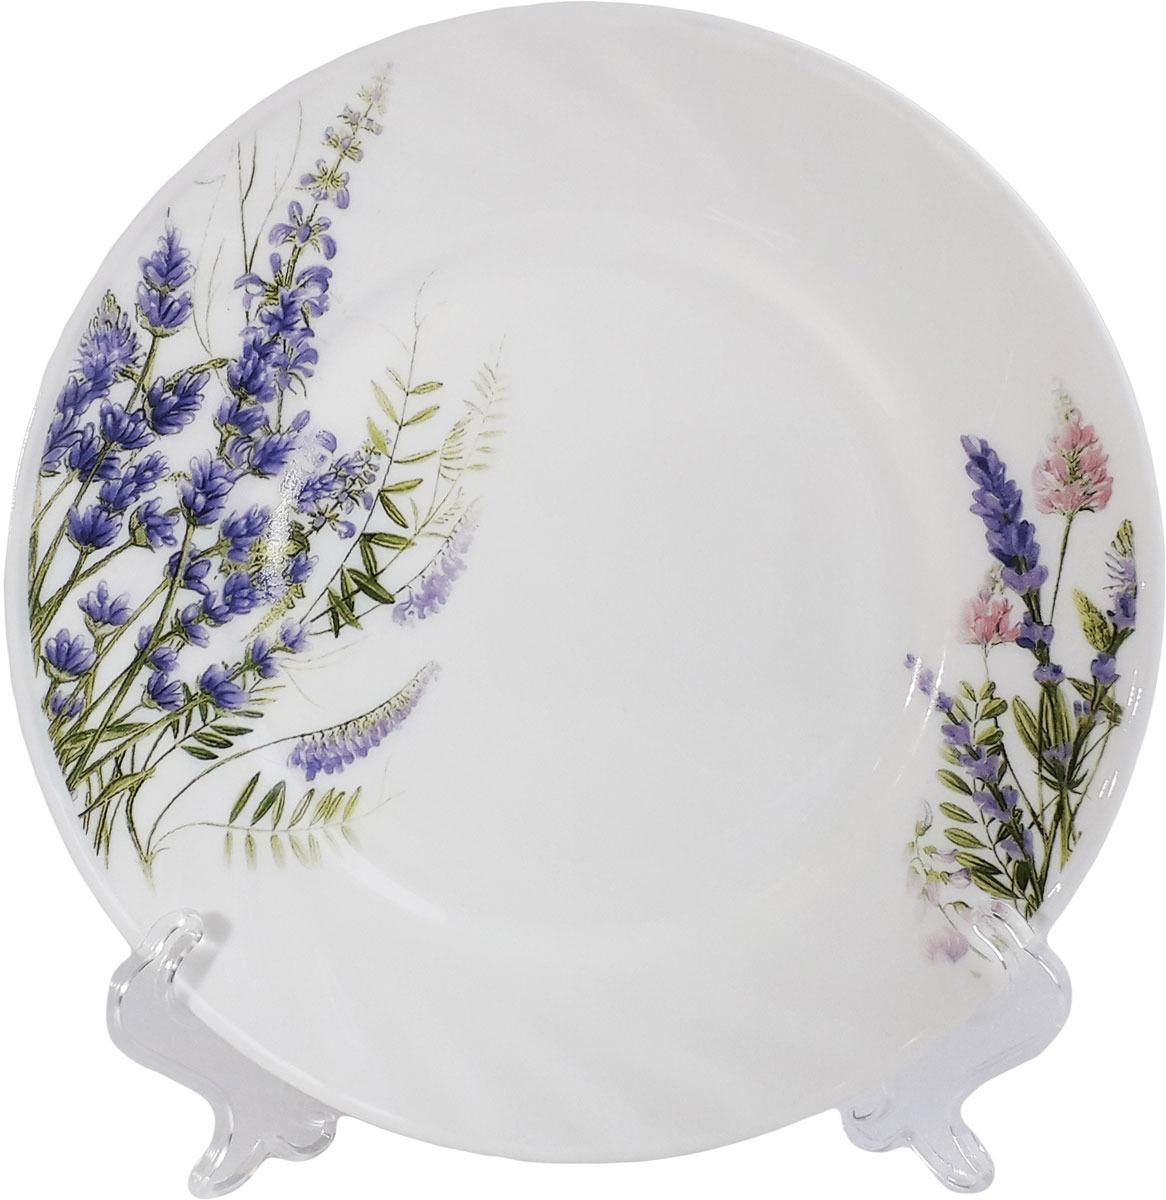 Тарелка обеденная МФК-профит Лаванда, диаметр 23 см сервиз столовый мфк профит лаванда 32 предмета